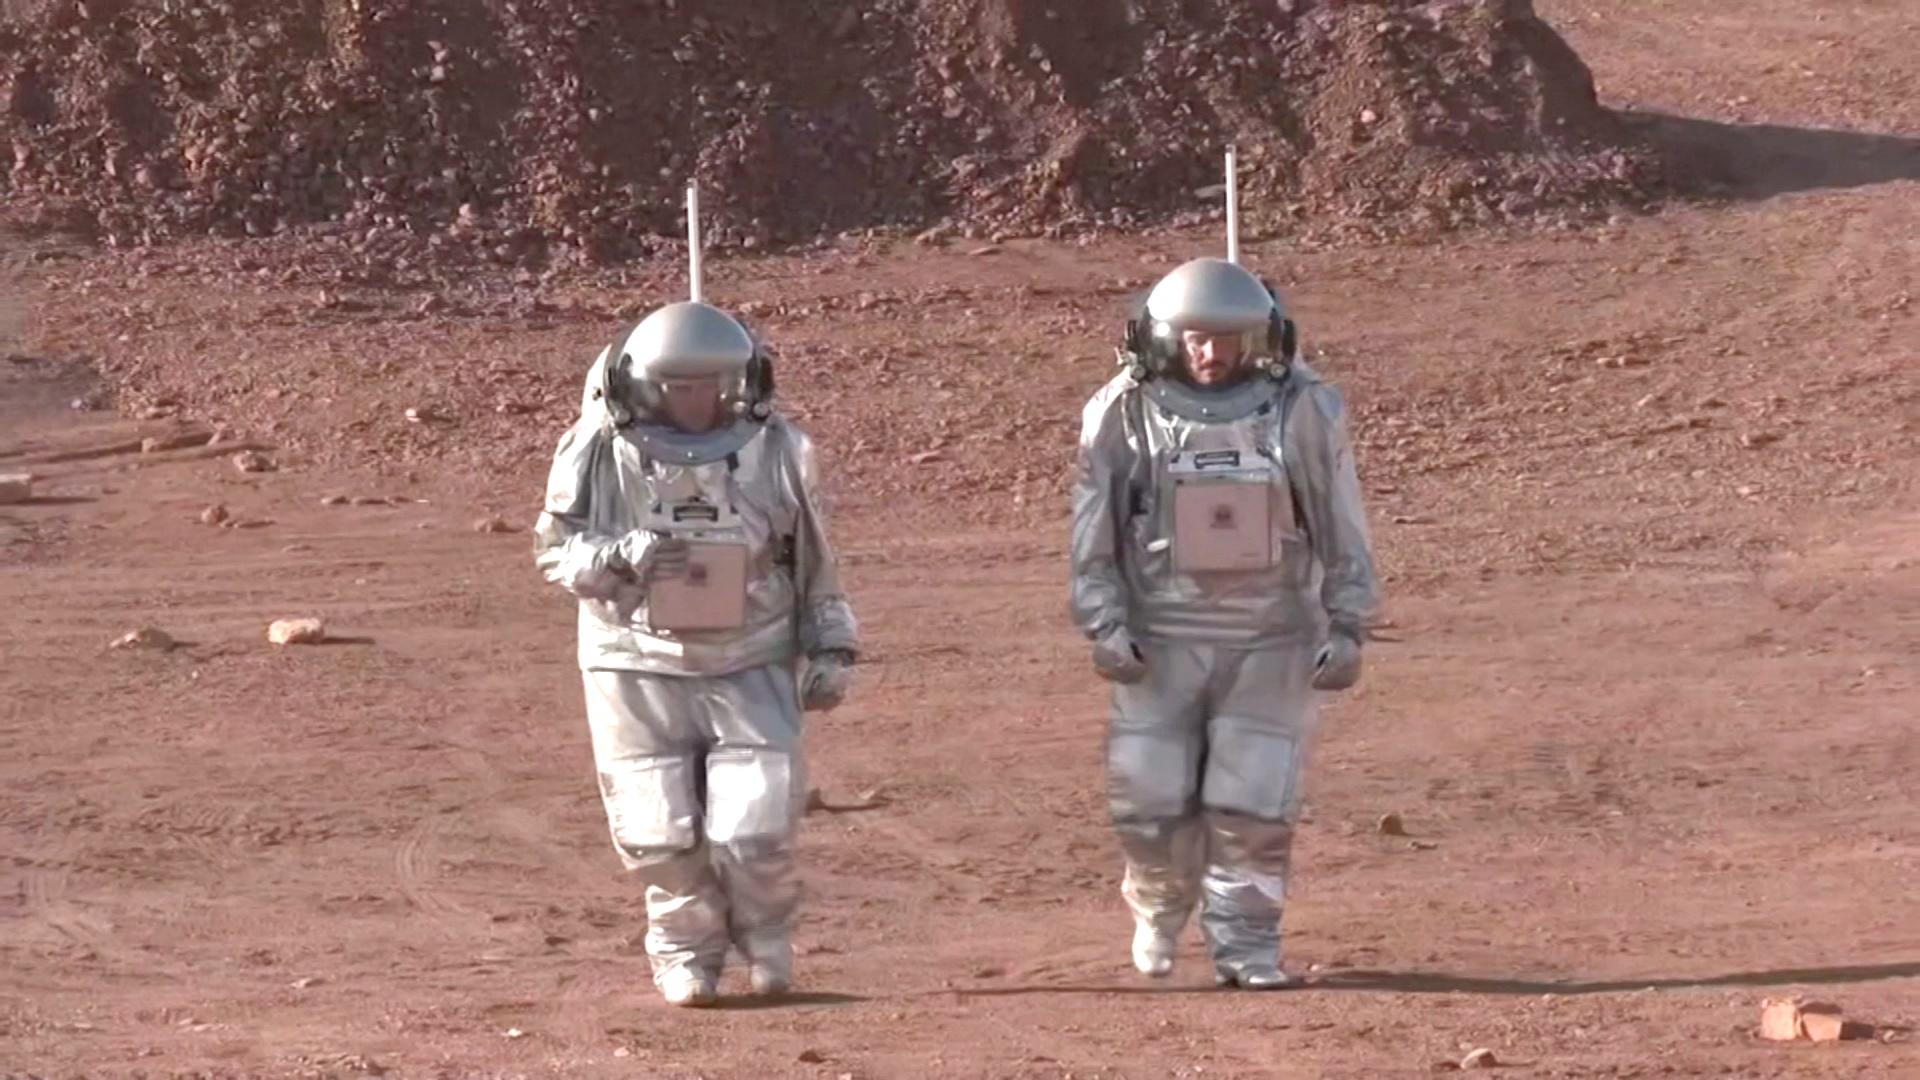 Как на Марсе: в Израиле имитируют жизнь на Красной планете